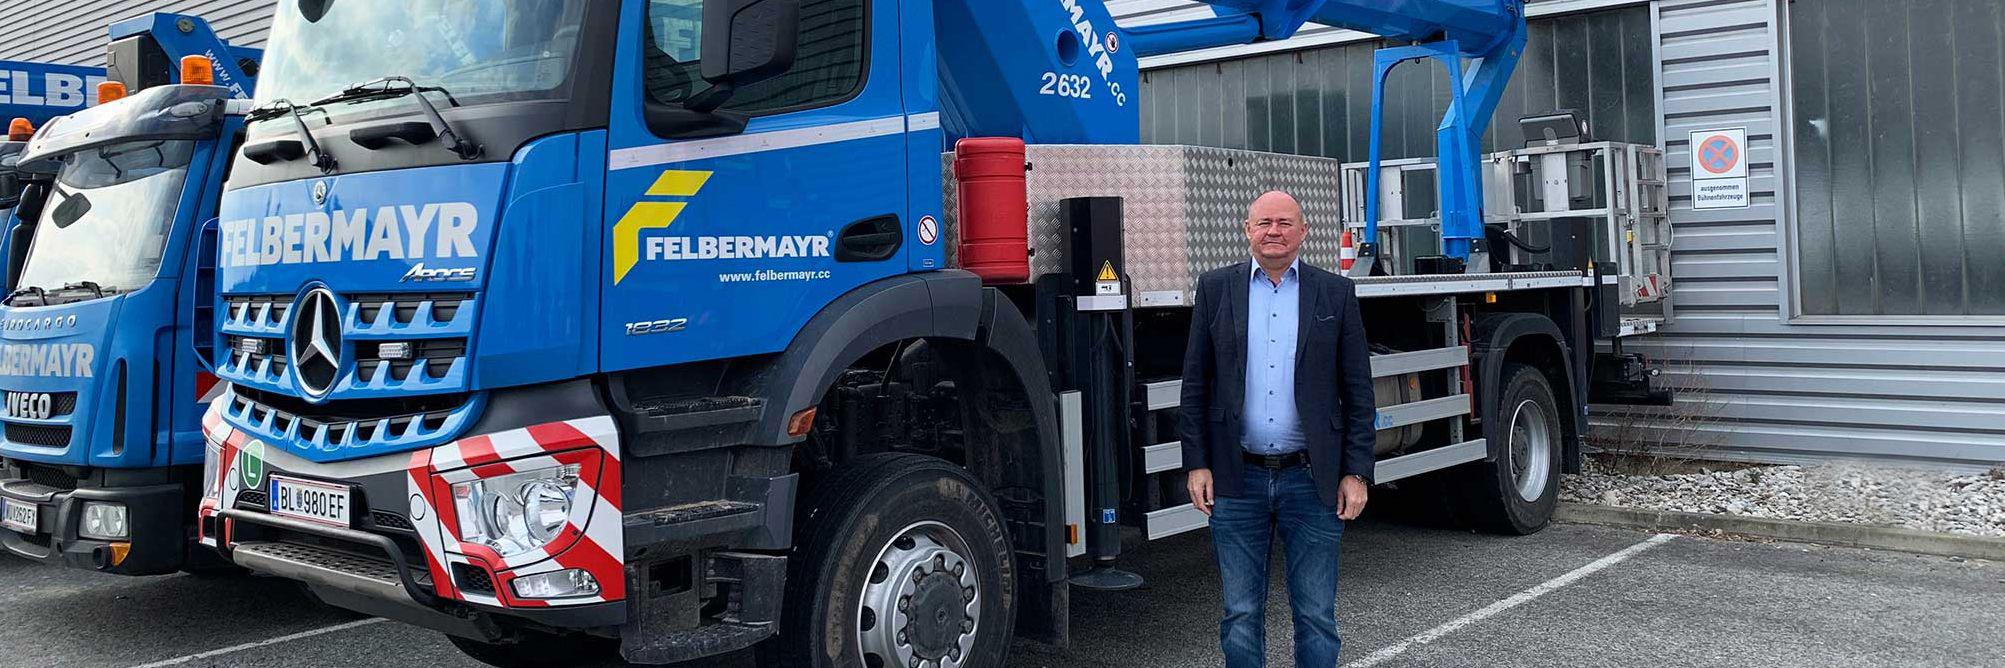 Închiriere platforme-Felbermayr în Viena/Lanzendorf sub noua conducere Slider